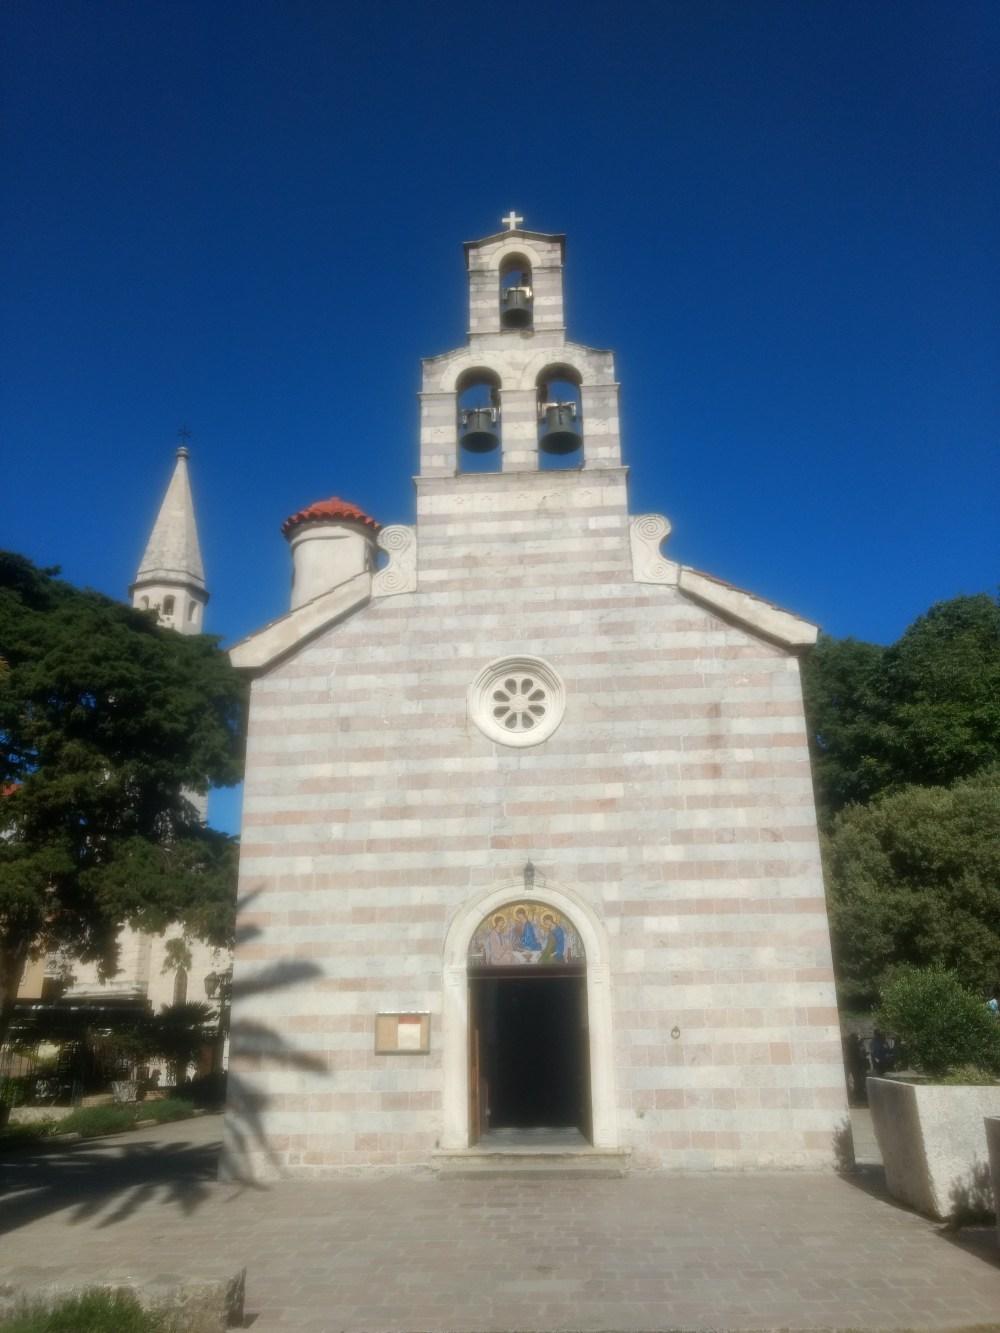 Church of the Holy Trinity, Old Town, Budva, Montenegro